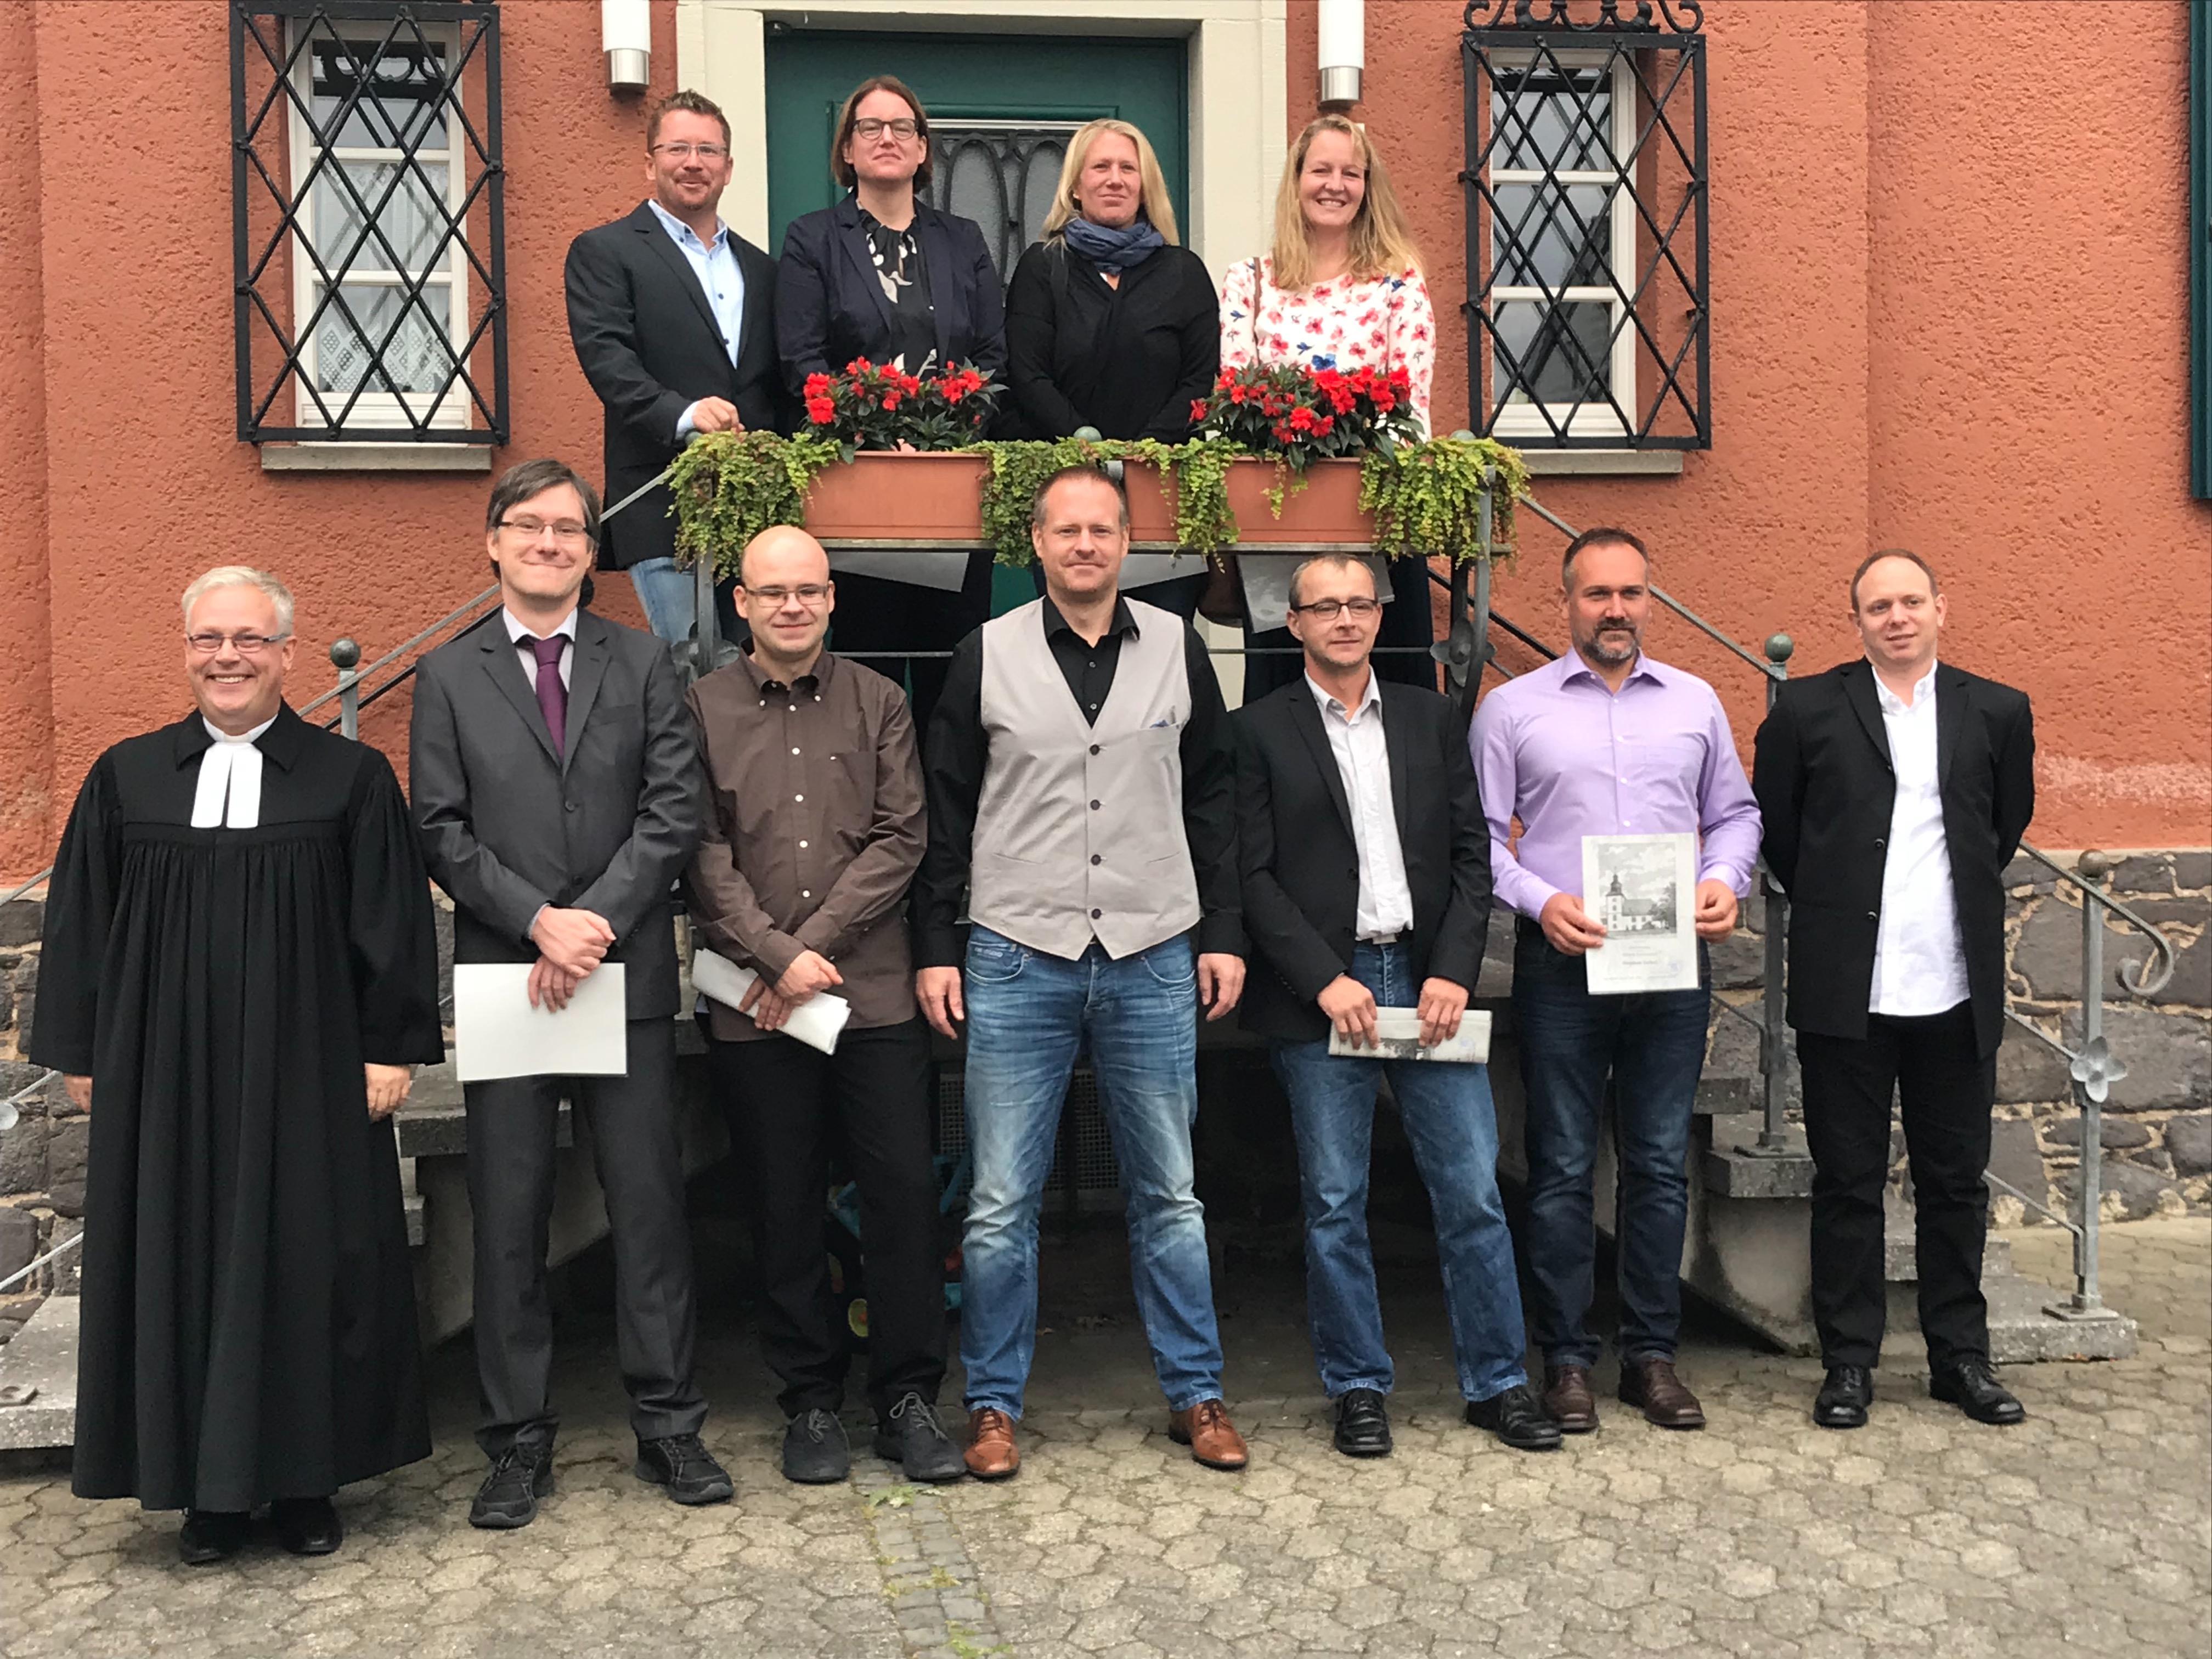 Silbernes Konfirmationsjubiläum in Trais-Horloff